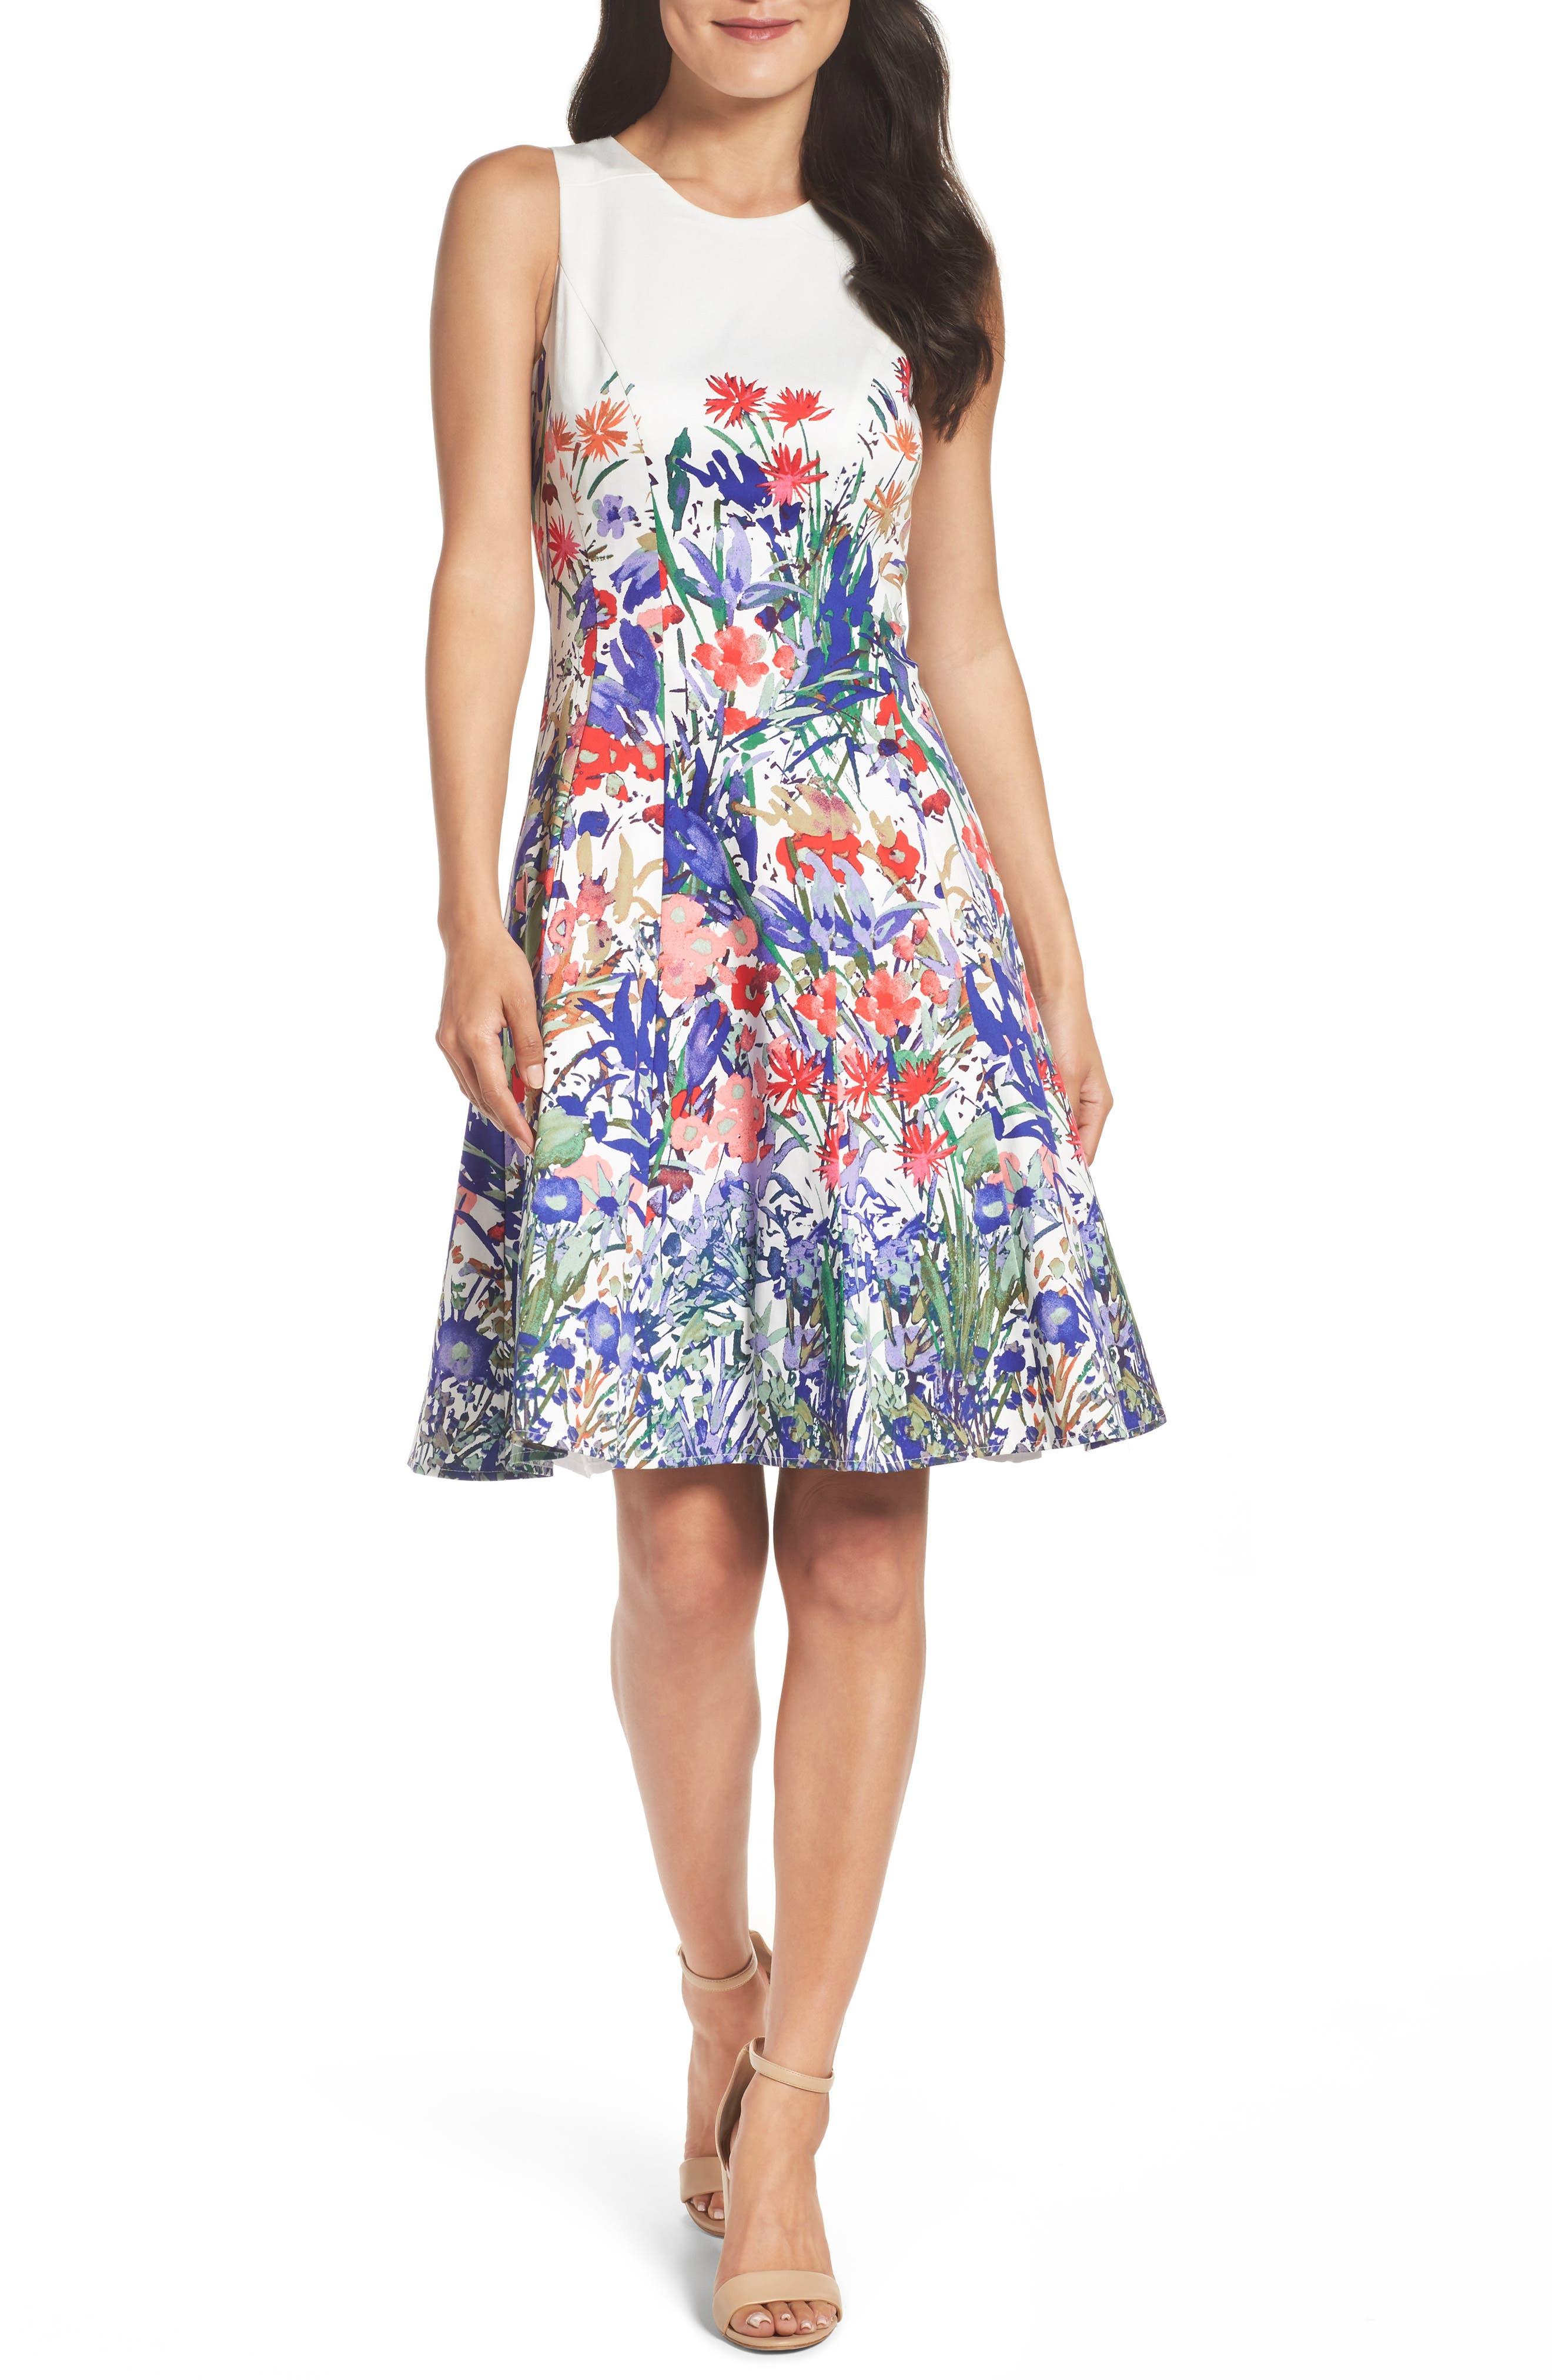 Cottage Garden Fit & Flare Dress,                         Main,                         color, Soft White/ Coral/ Purple